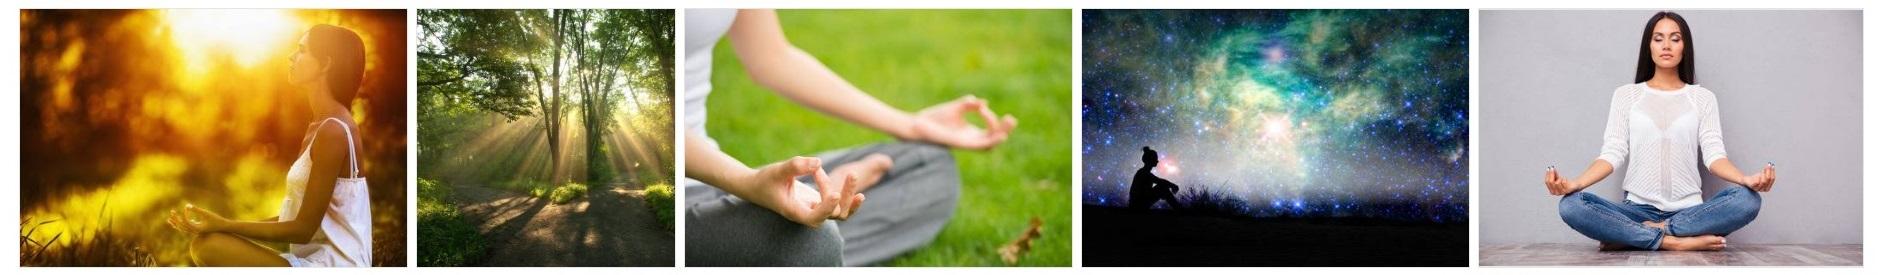 meditation purpose